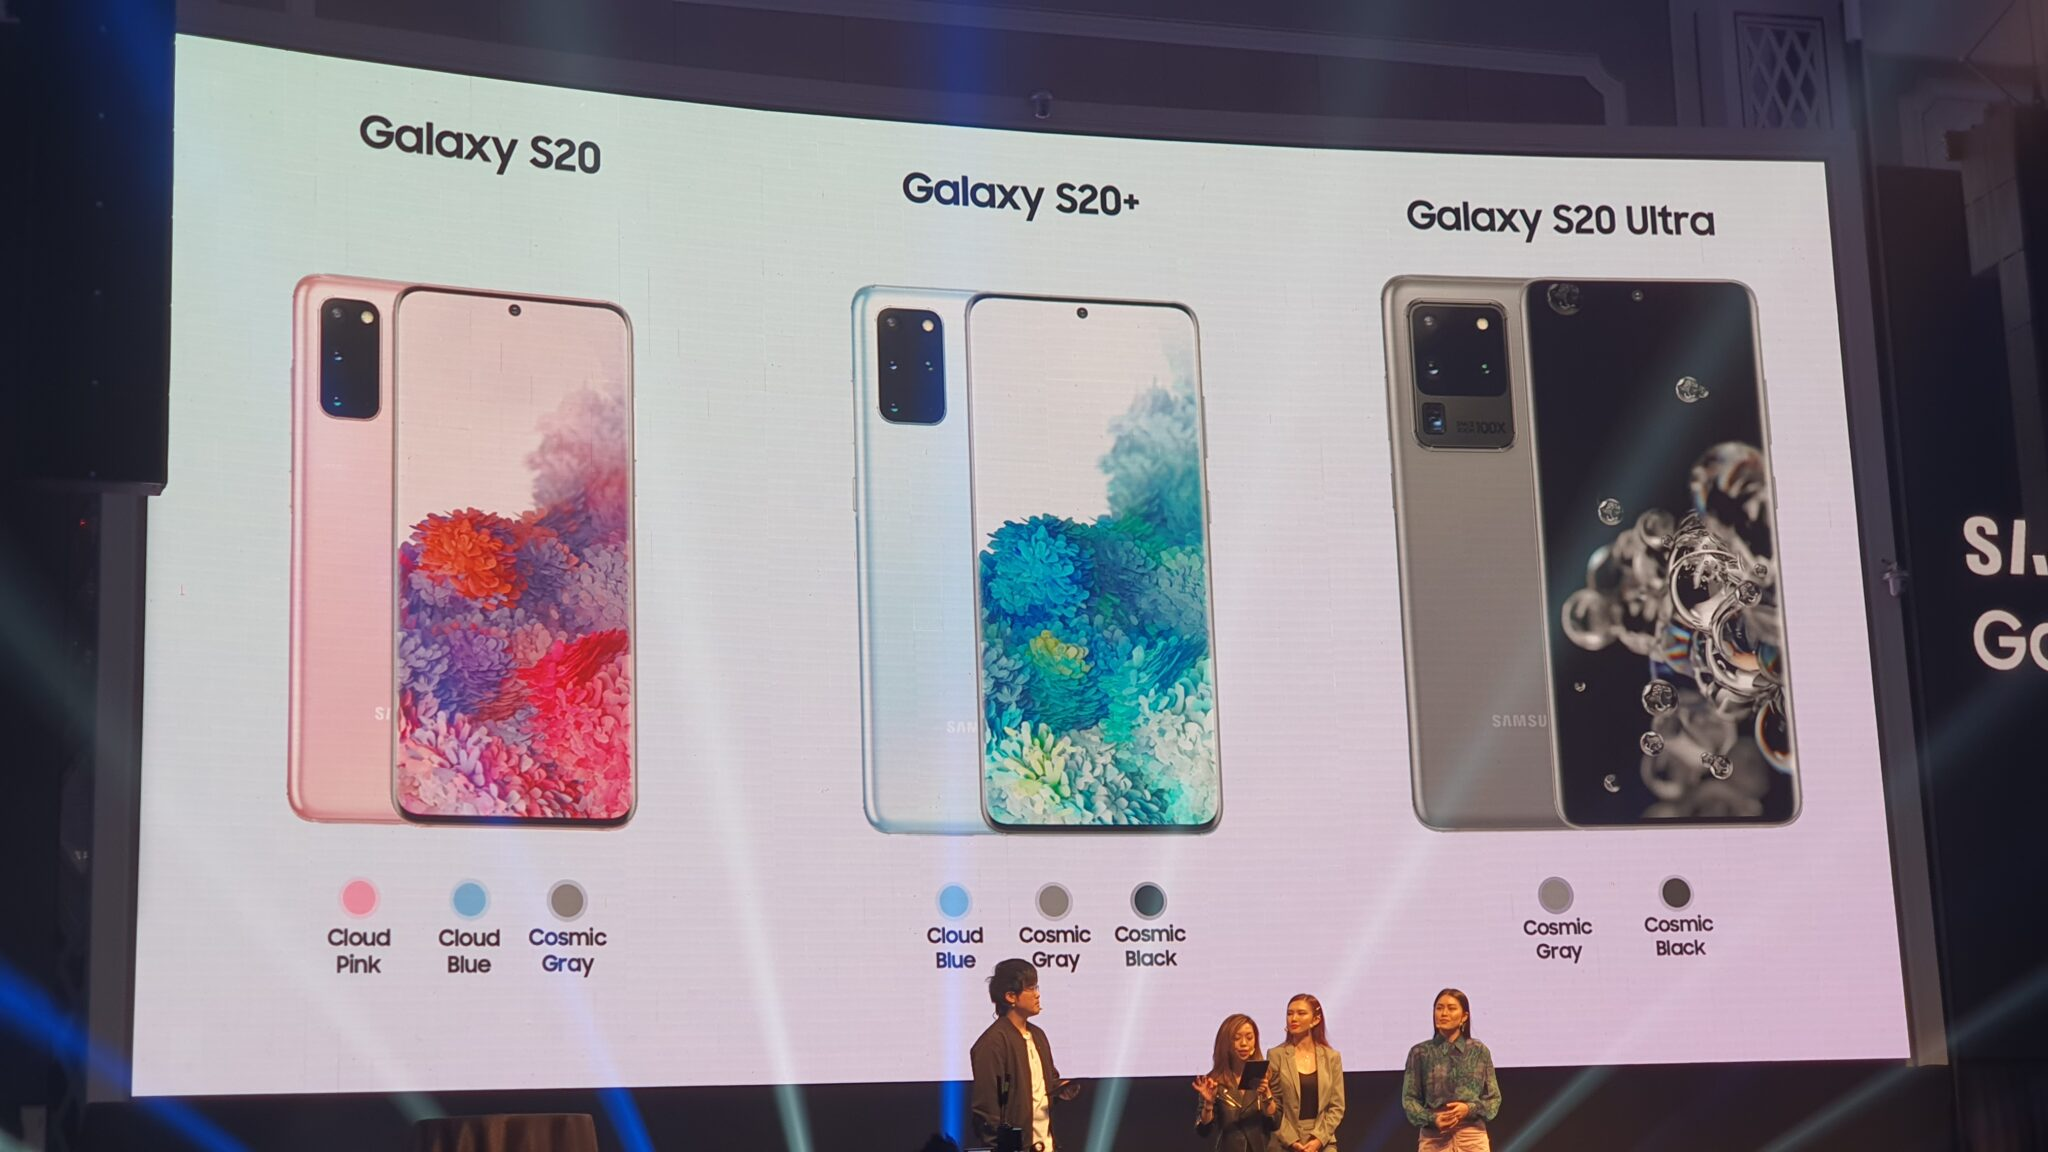 Galaxy S20 colour variants